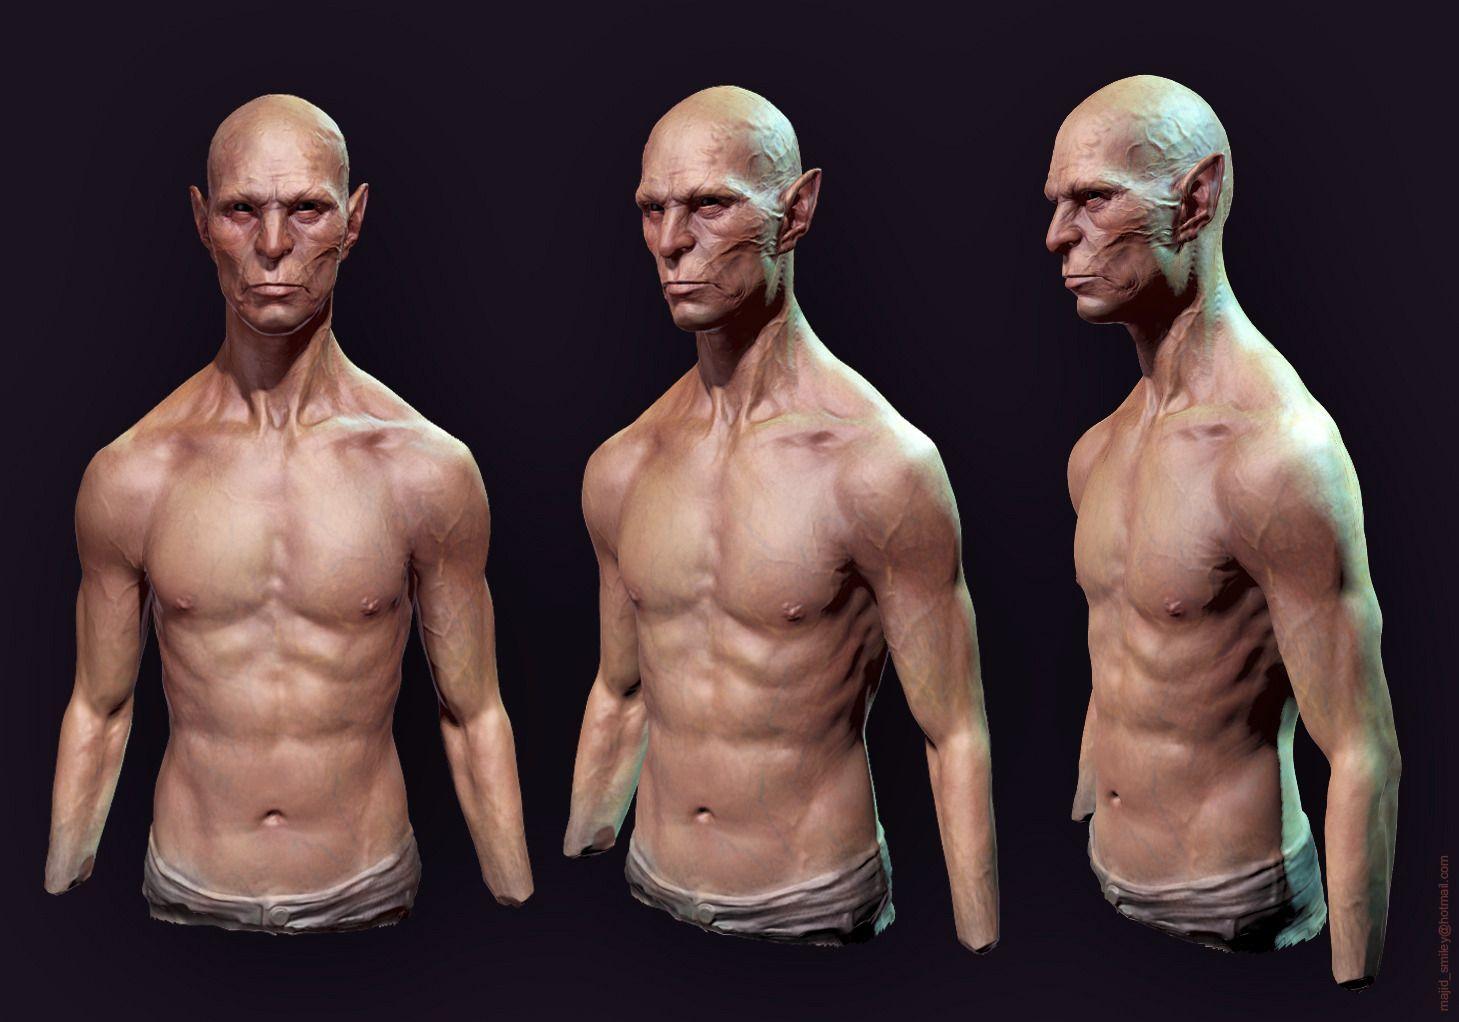 My Zbrush Artworks - Majid Esmaeili - Page 9 | Characters 3D ...